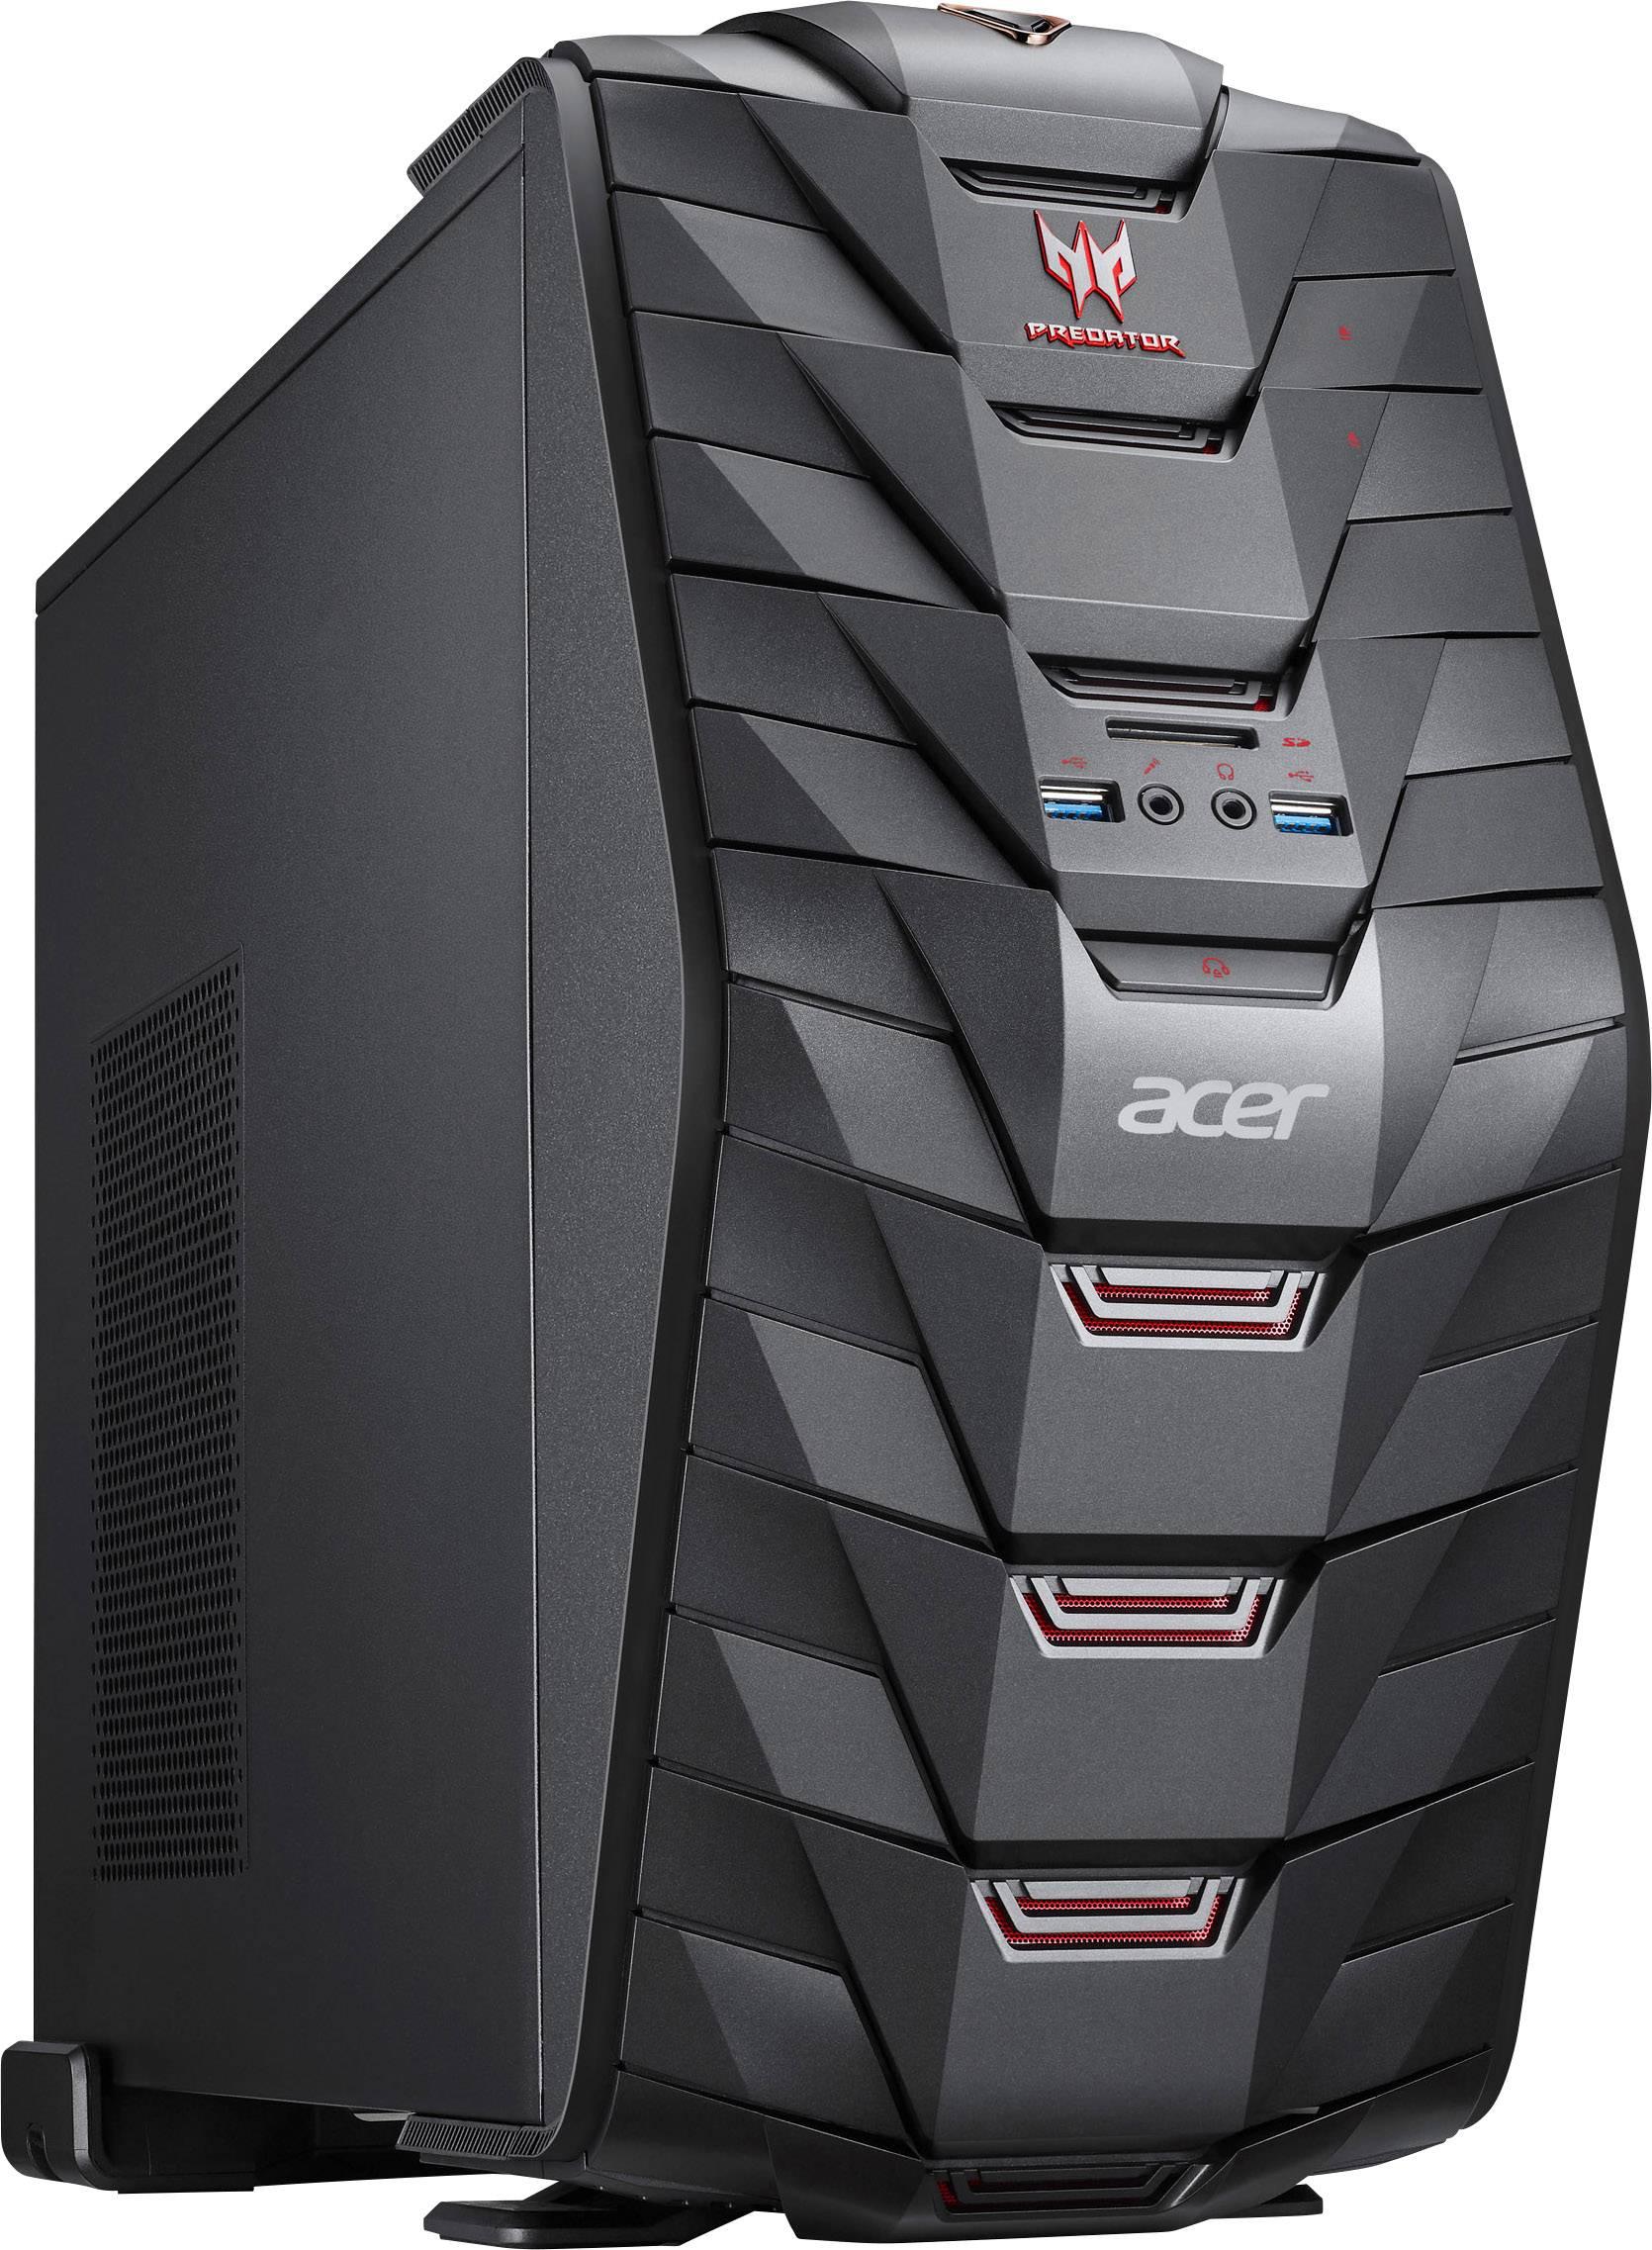 Acer Predator G3-710 AMD Graphics Driver PC